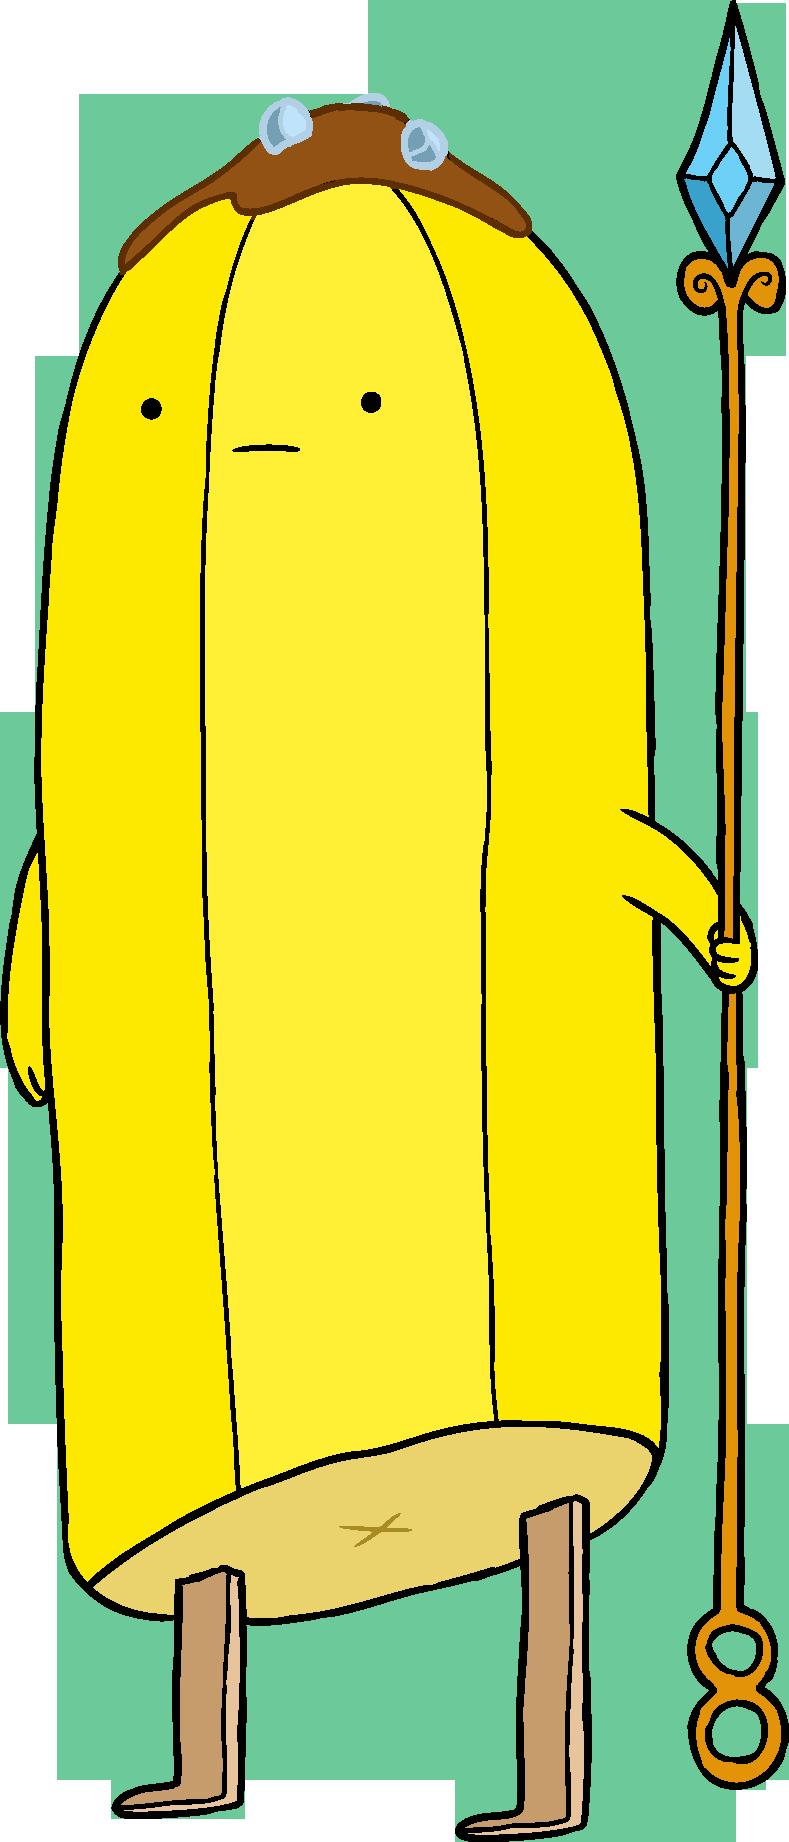 Banana Guard Mascot